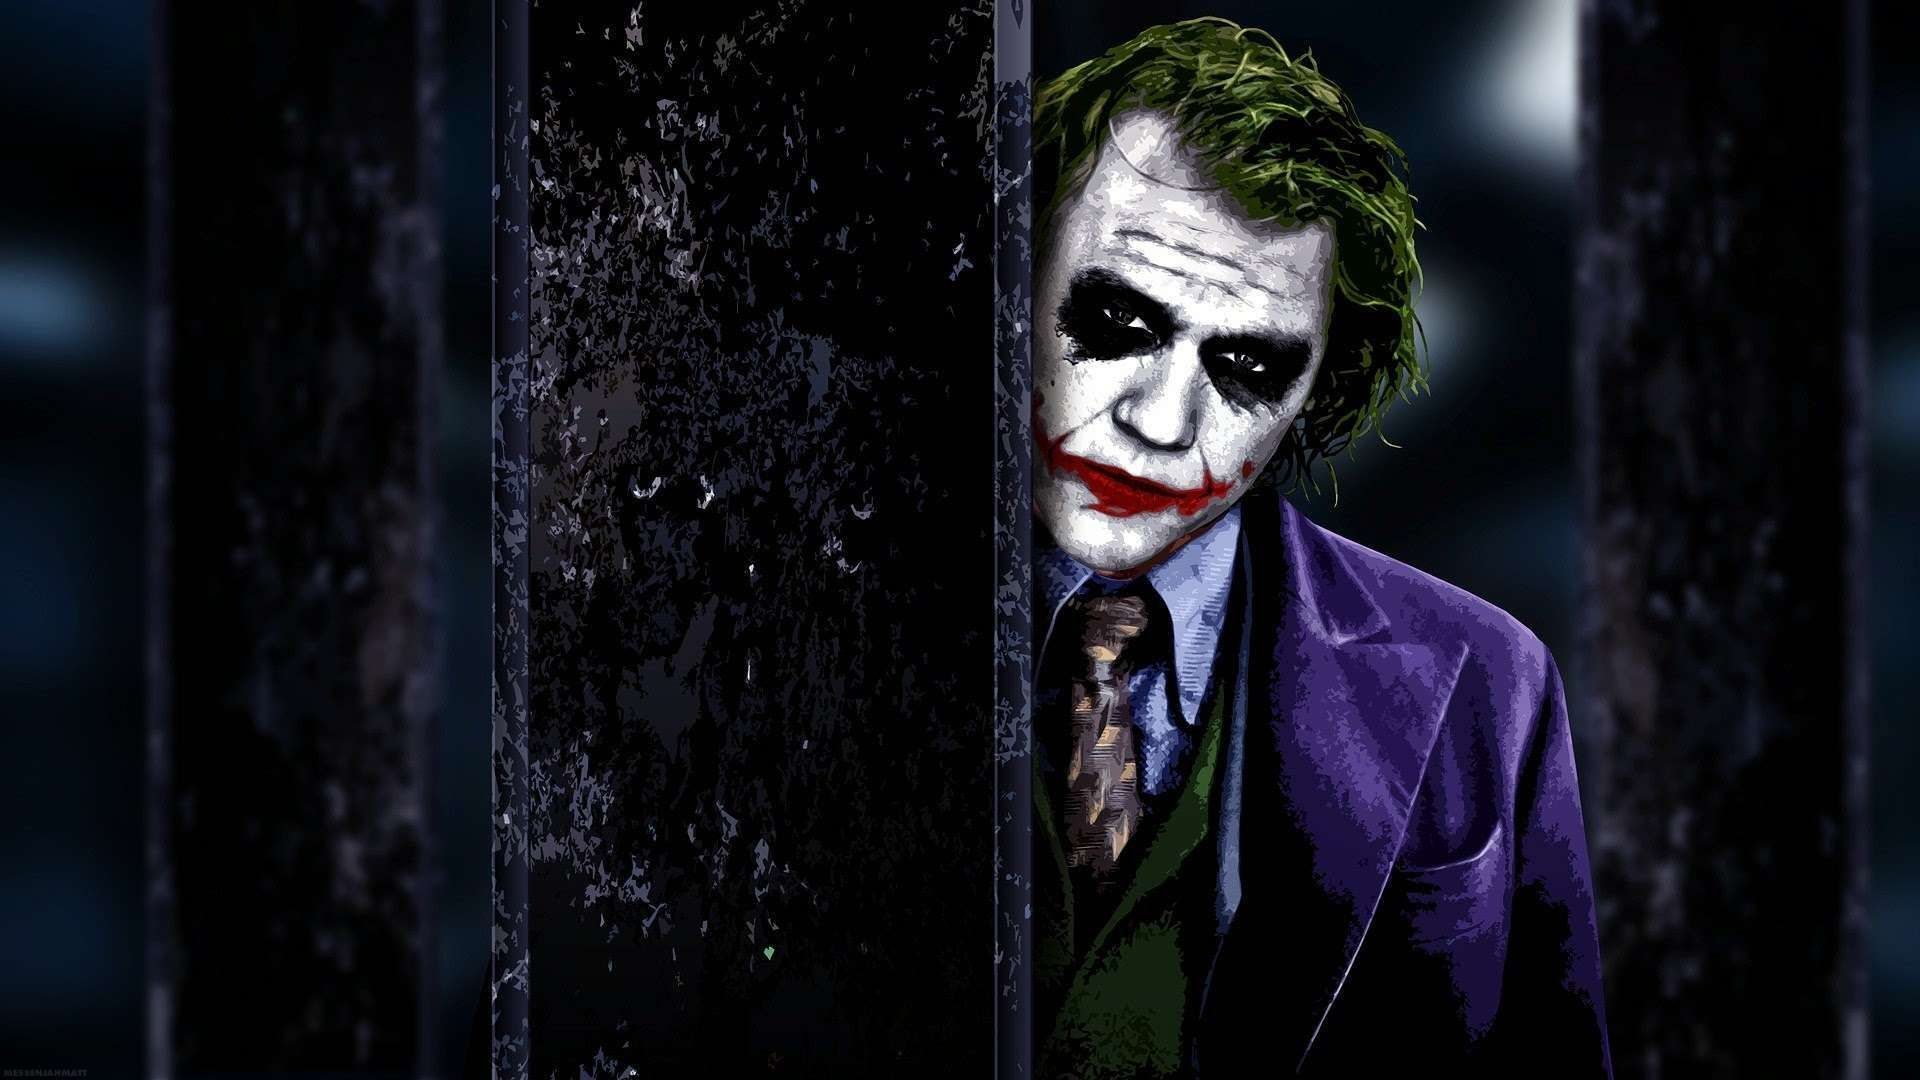 Joker Hd Images Wallpaper 1080p Joker Wallpapers Joker Images Joker